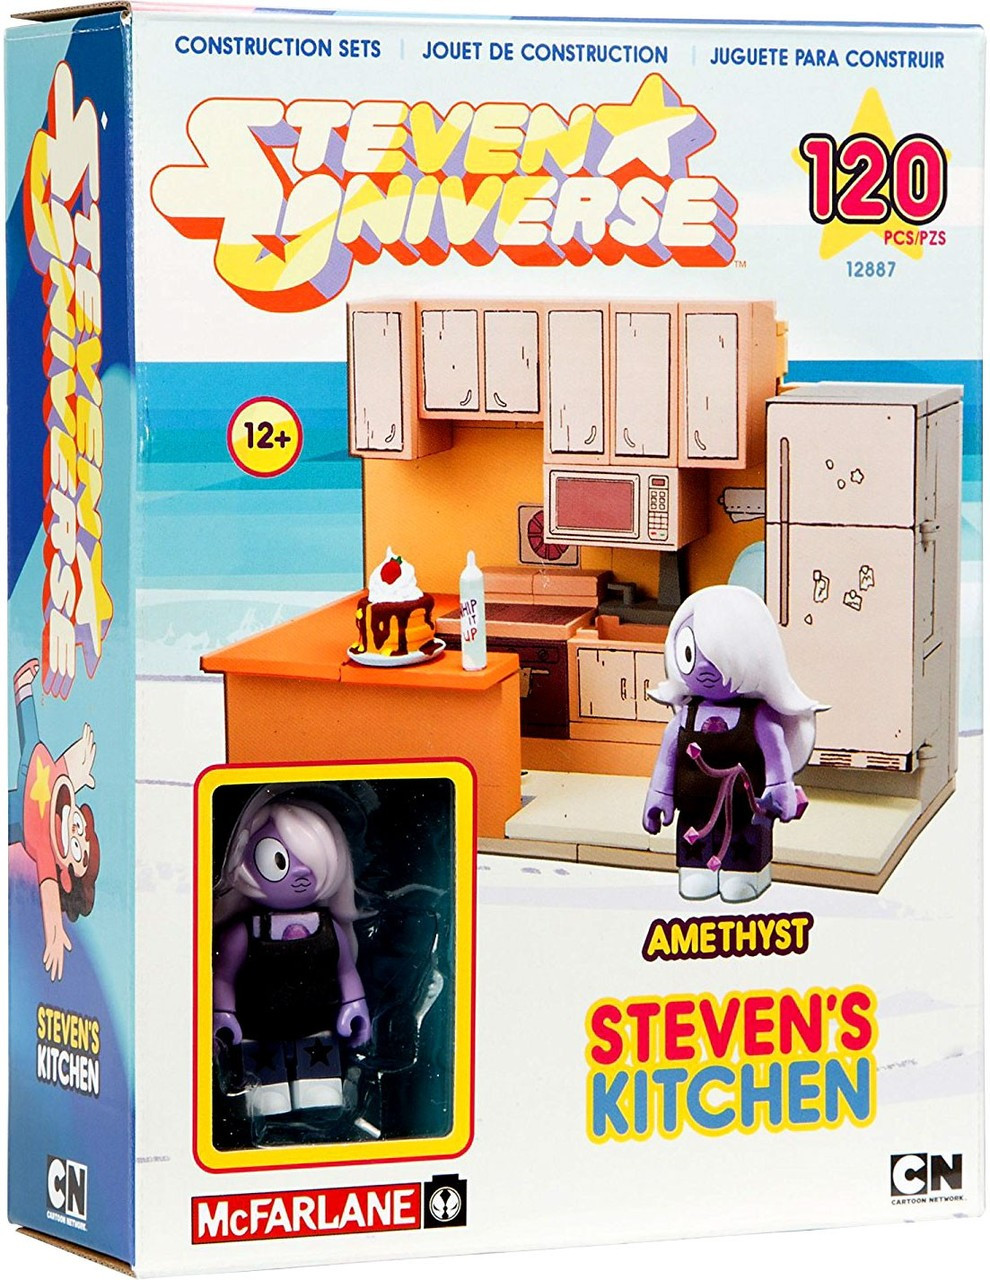 McFarlane Steven Universe Kitchen AMETHYST Construction Figure Only